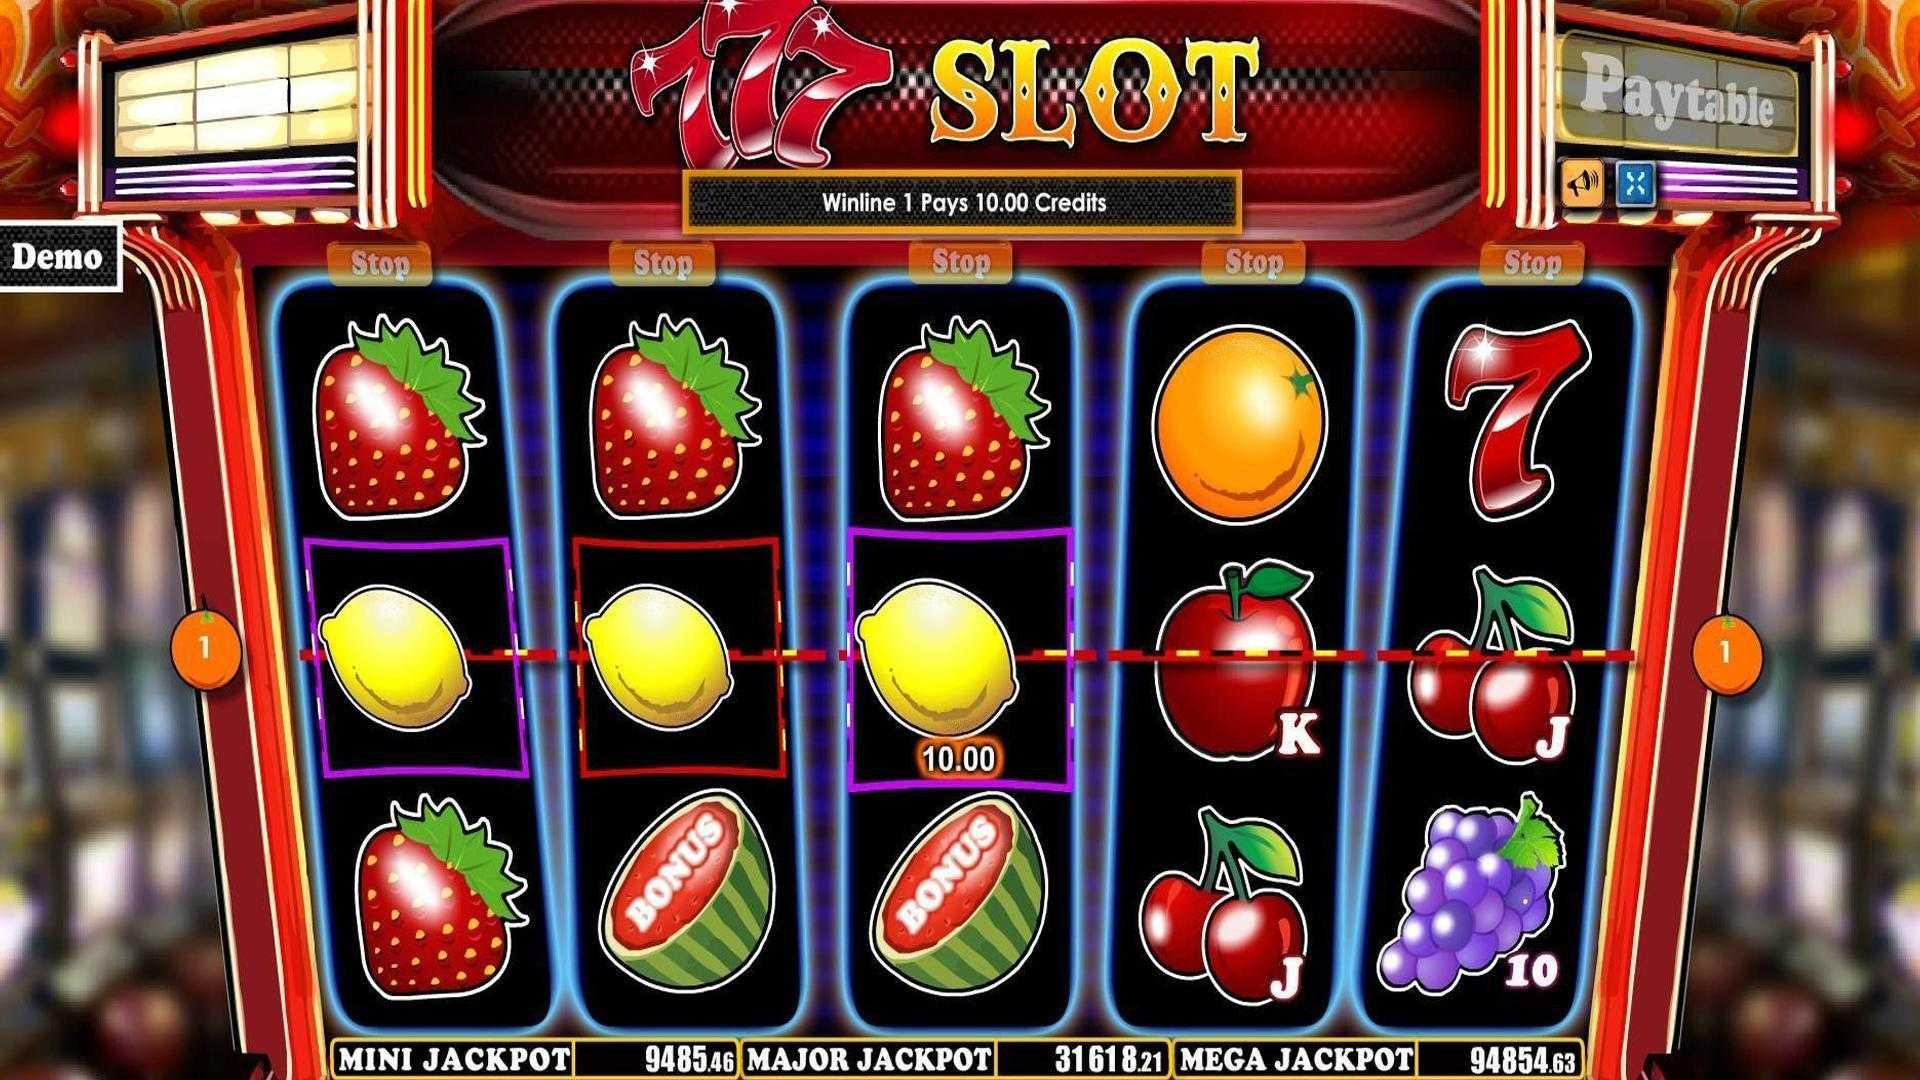 Big jackpot drawings in Russian casinos